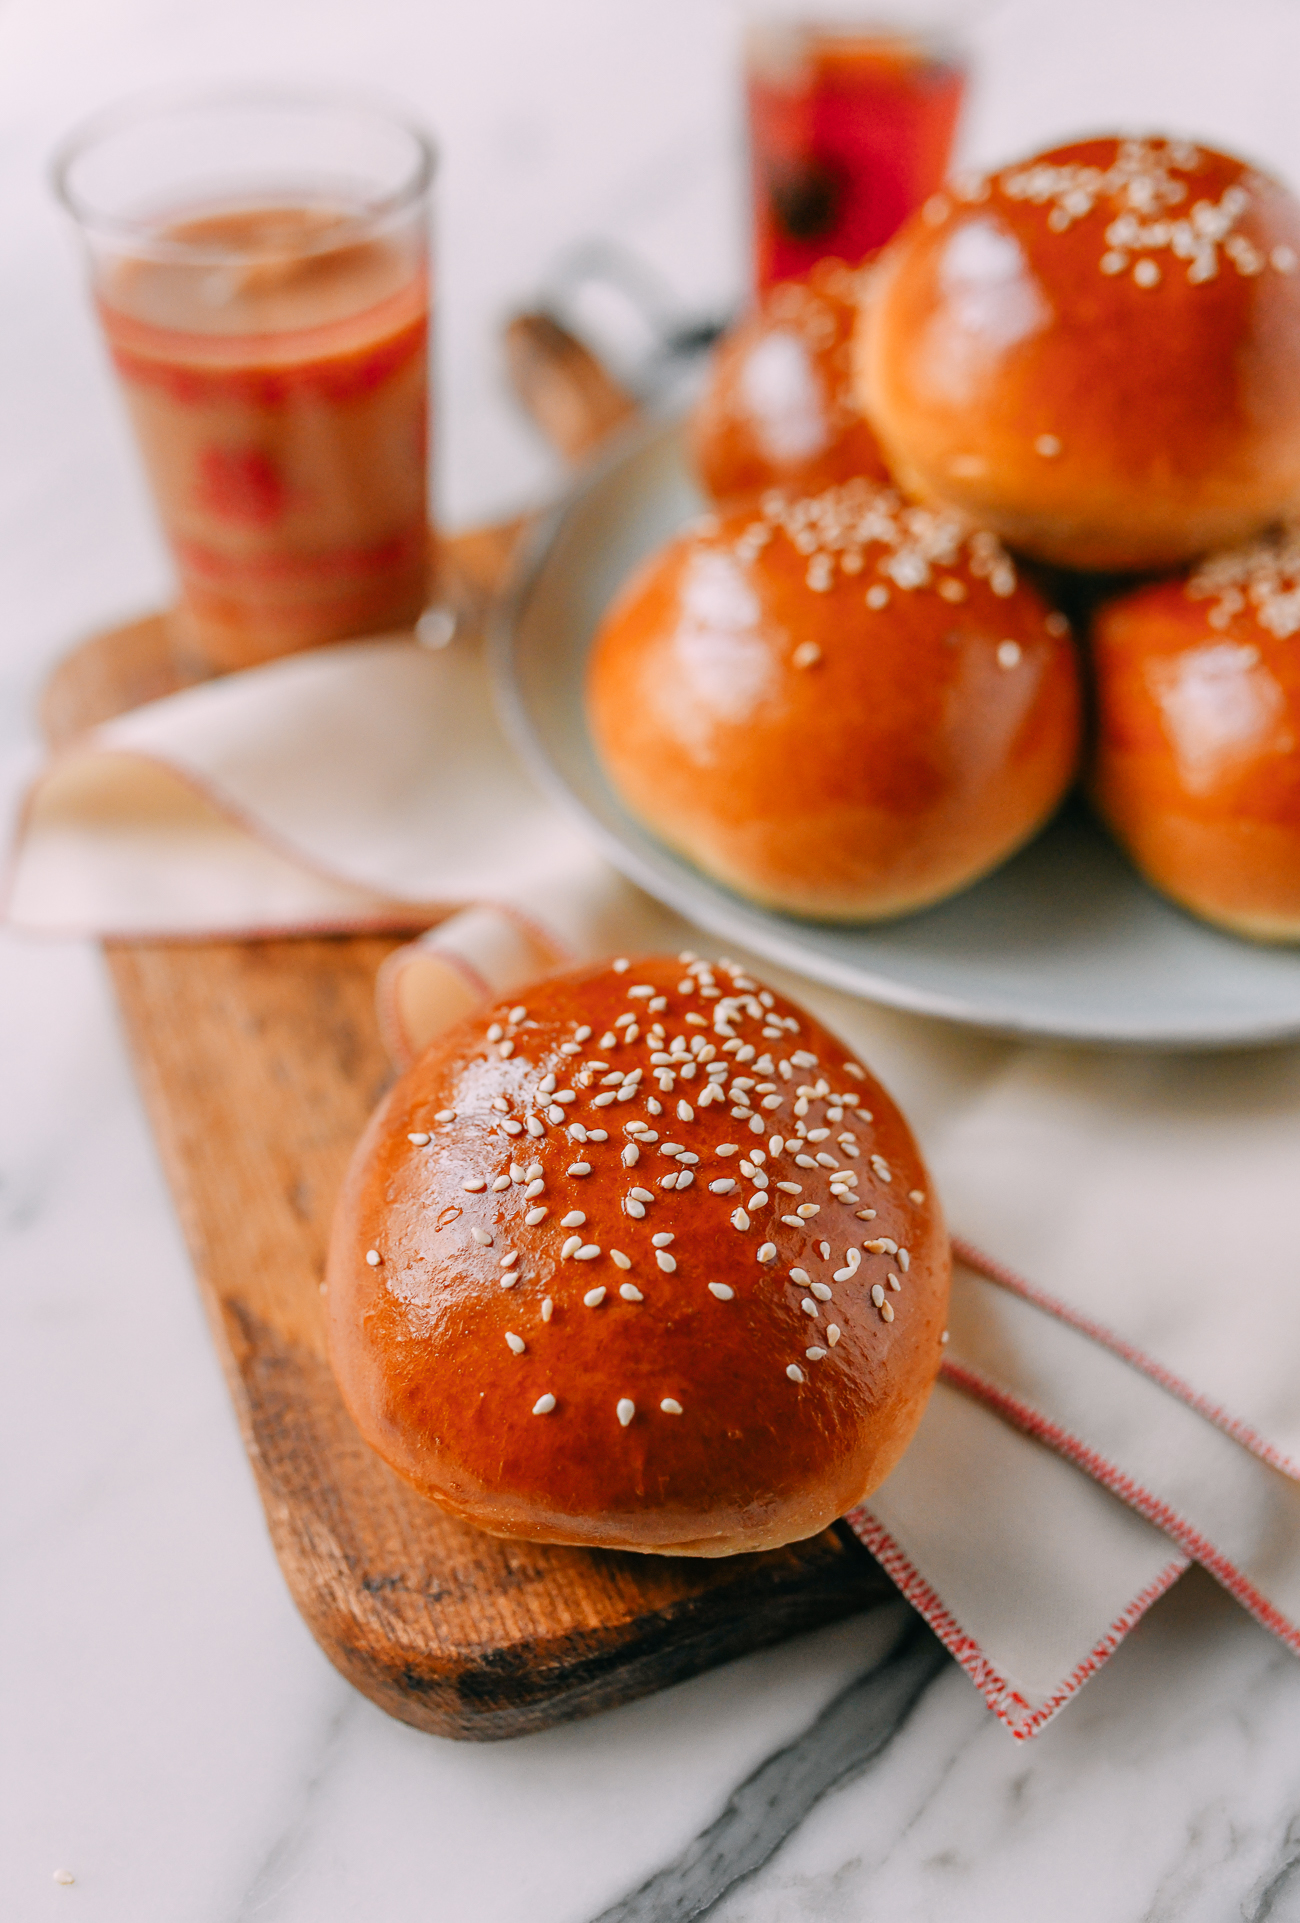 Cha siu bao baked chinese pork buns